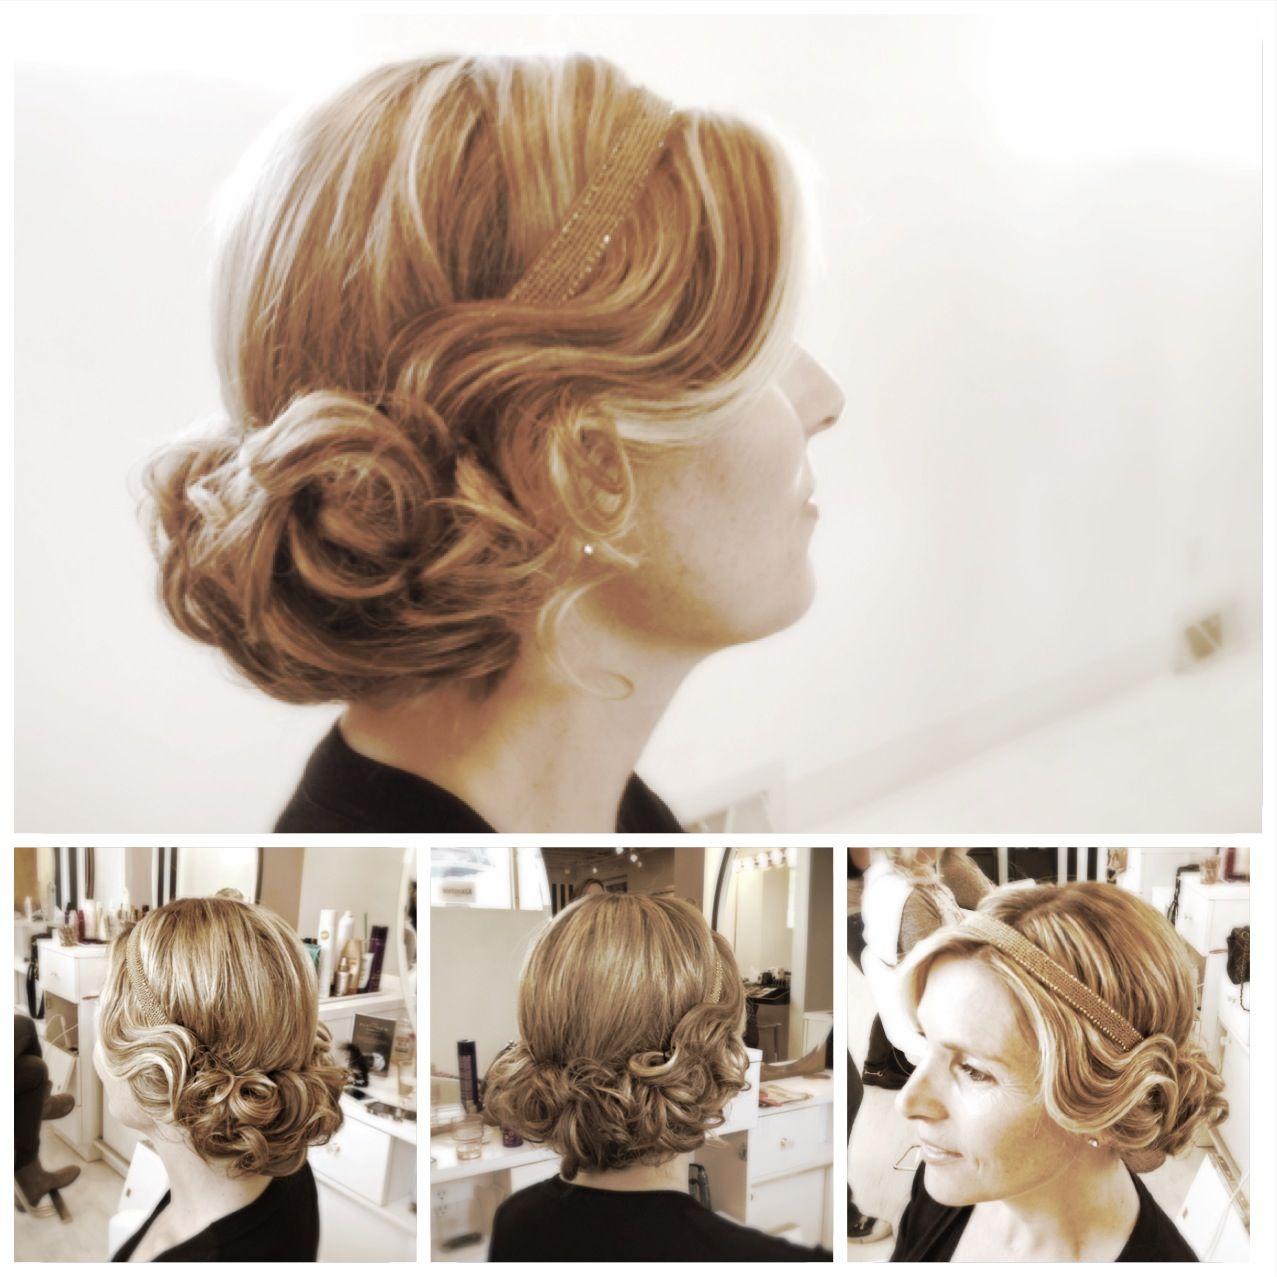 20s inspired flapper updo | Hair beauty, Hair makeup, Hair ...